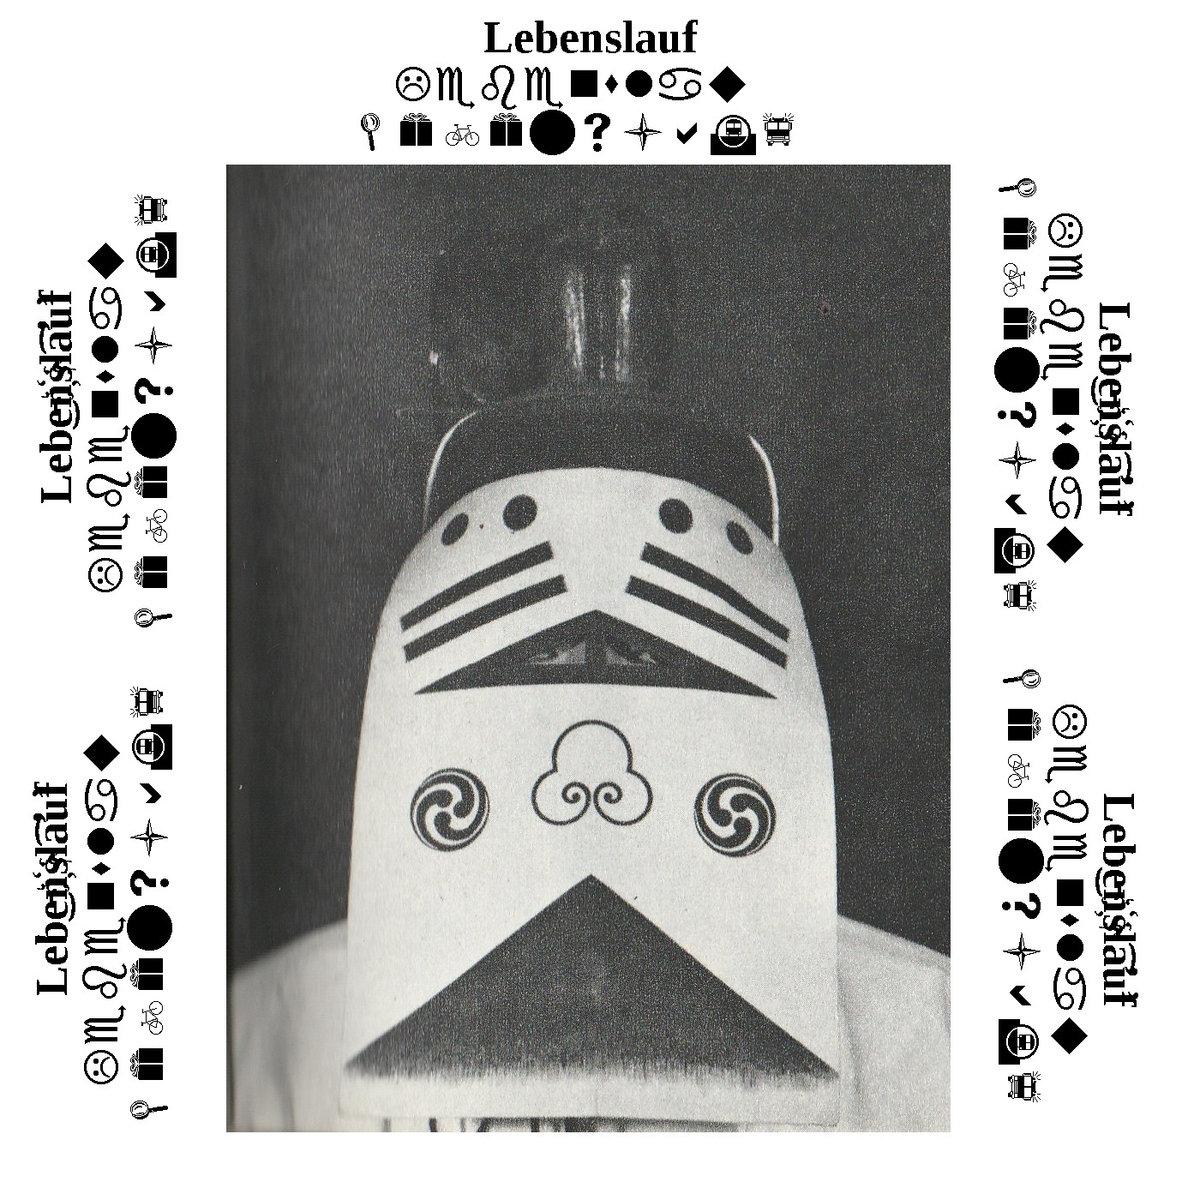 LEBENSLAUF – CV (Autoproduzione, 2020) 1 - fanzine